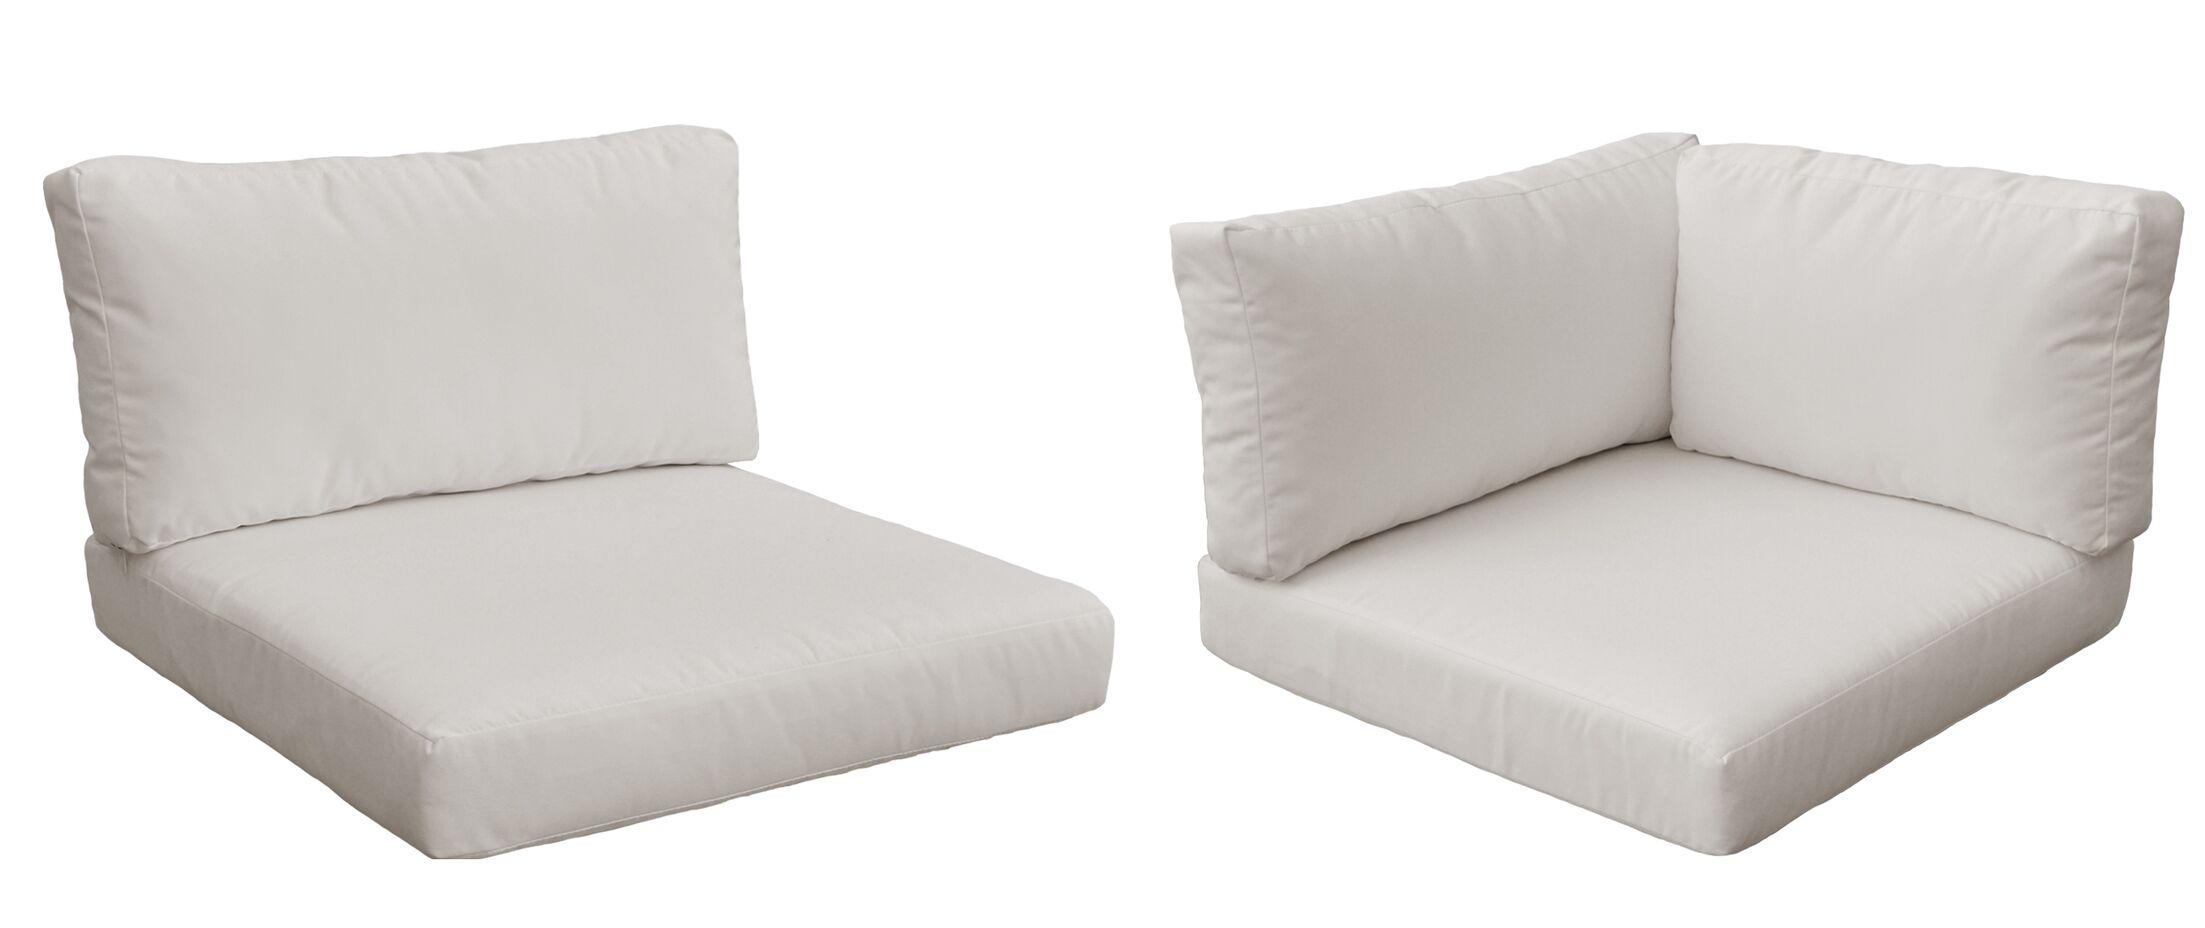 Monaco Outdoor 10 Piece Lounge Chair Cushion Set Fabric: Beige